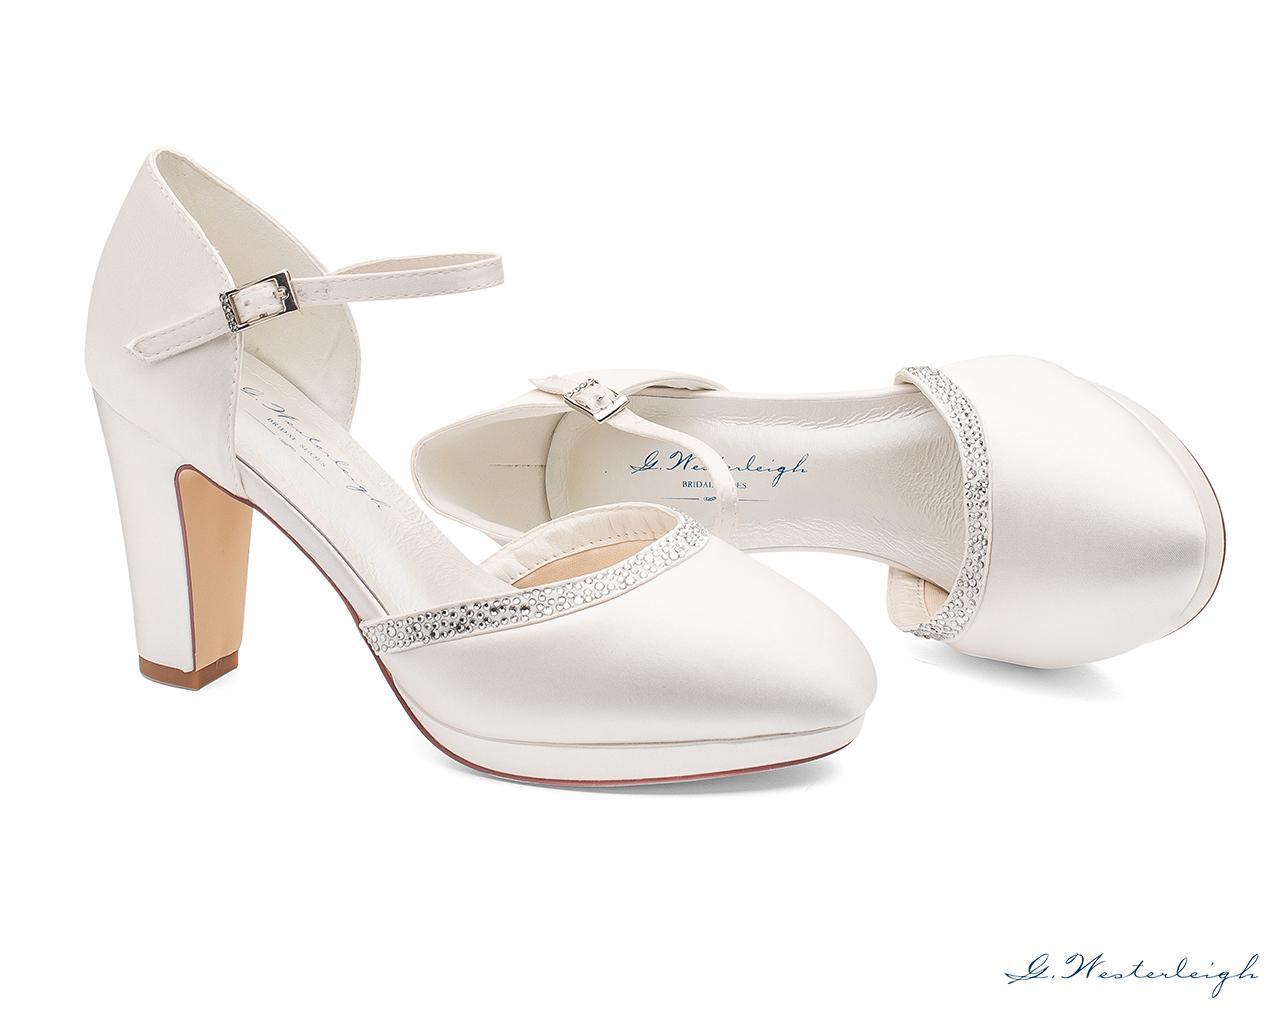 Svadobné topánky Gabrielle - Obrázok č. 2